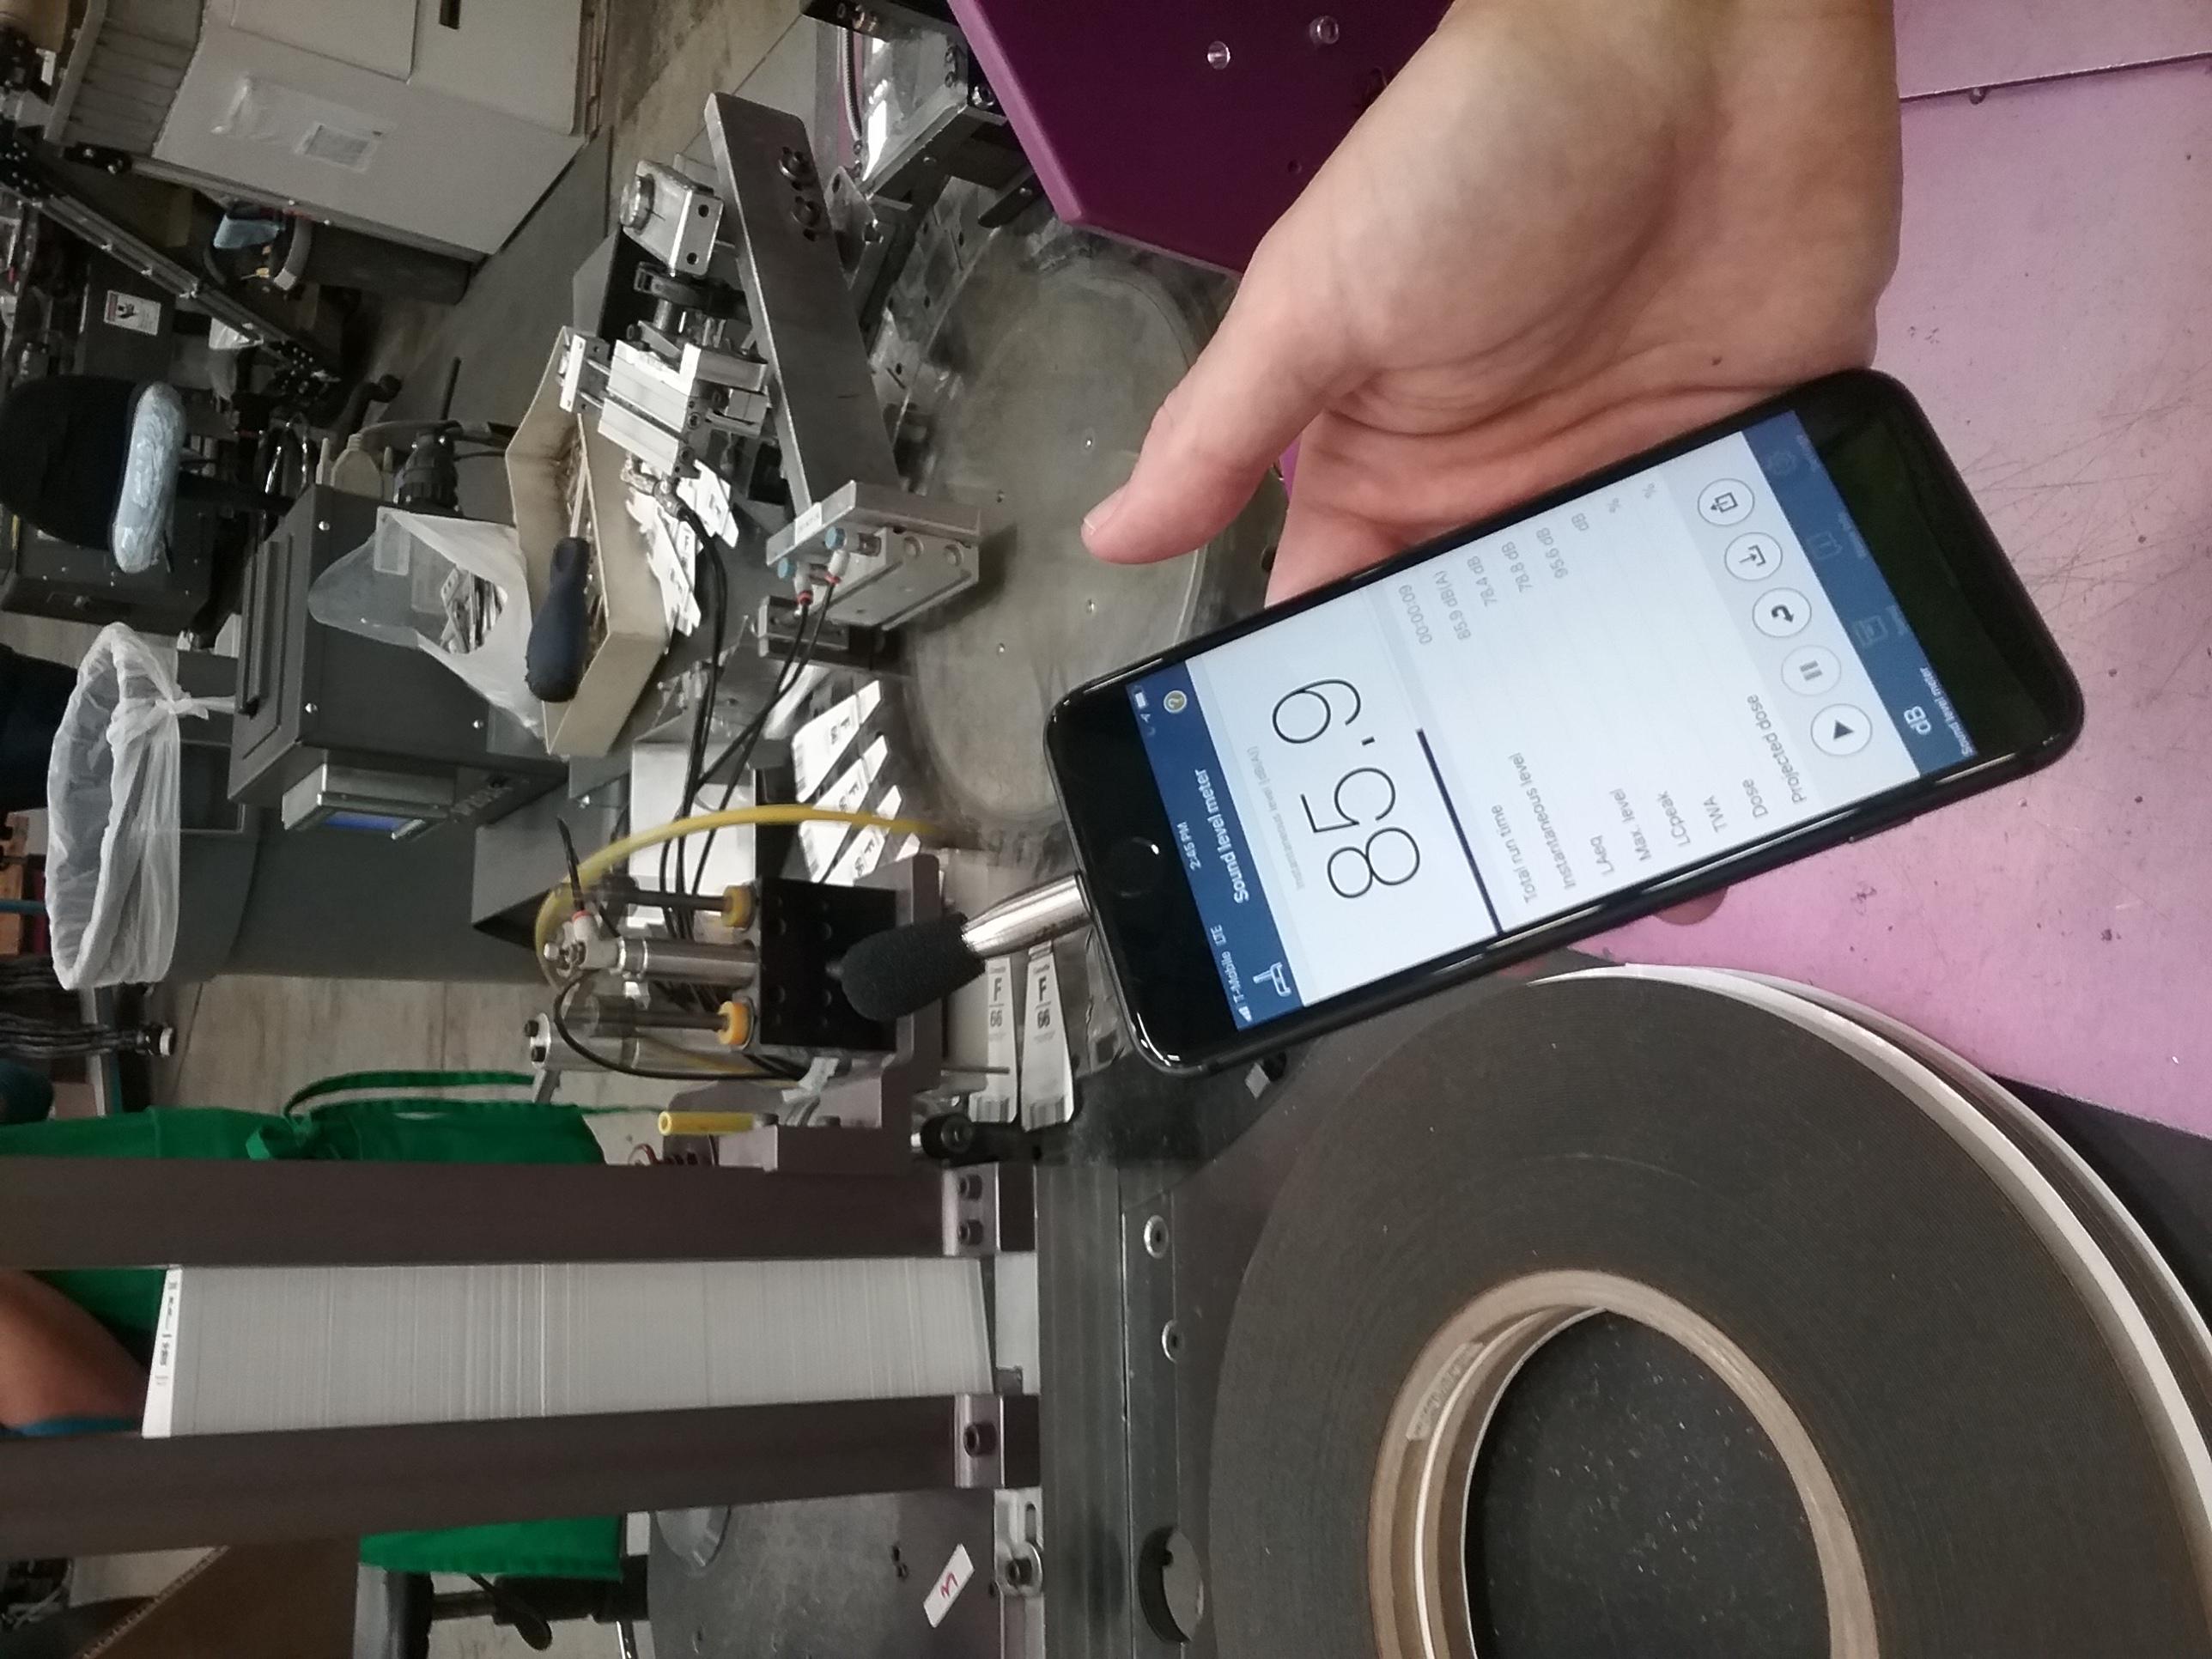 File:Making a noise measurement using the NIOSH SLM app jpg